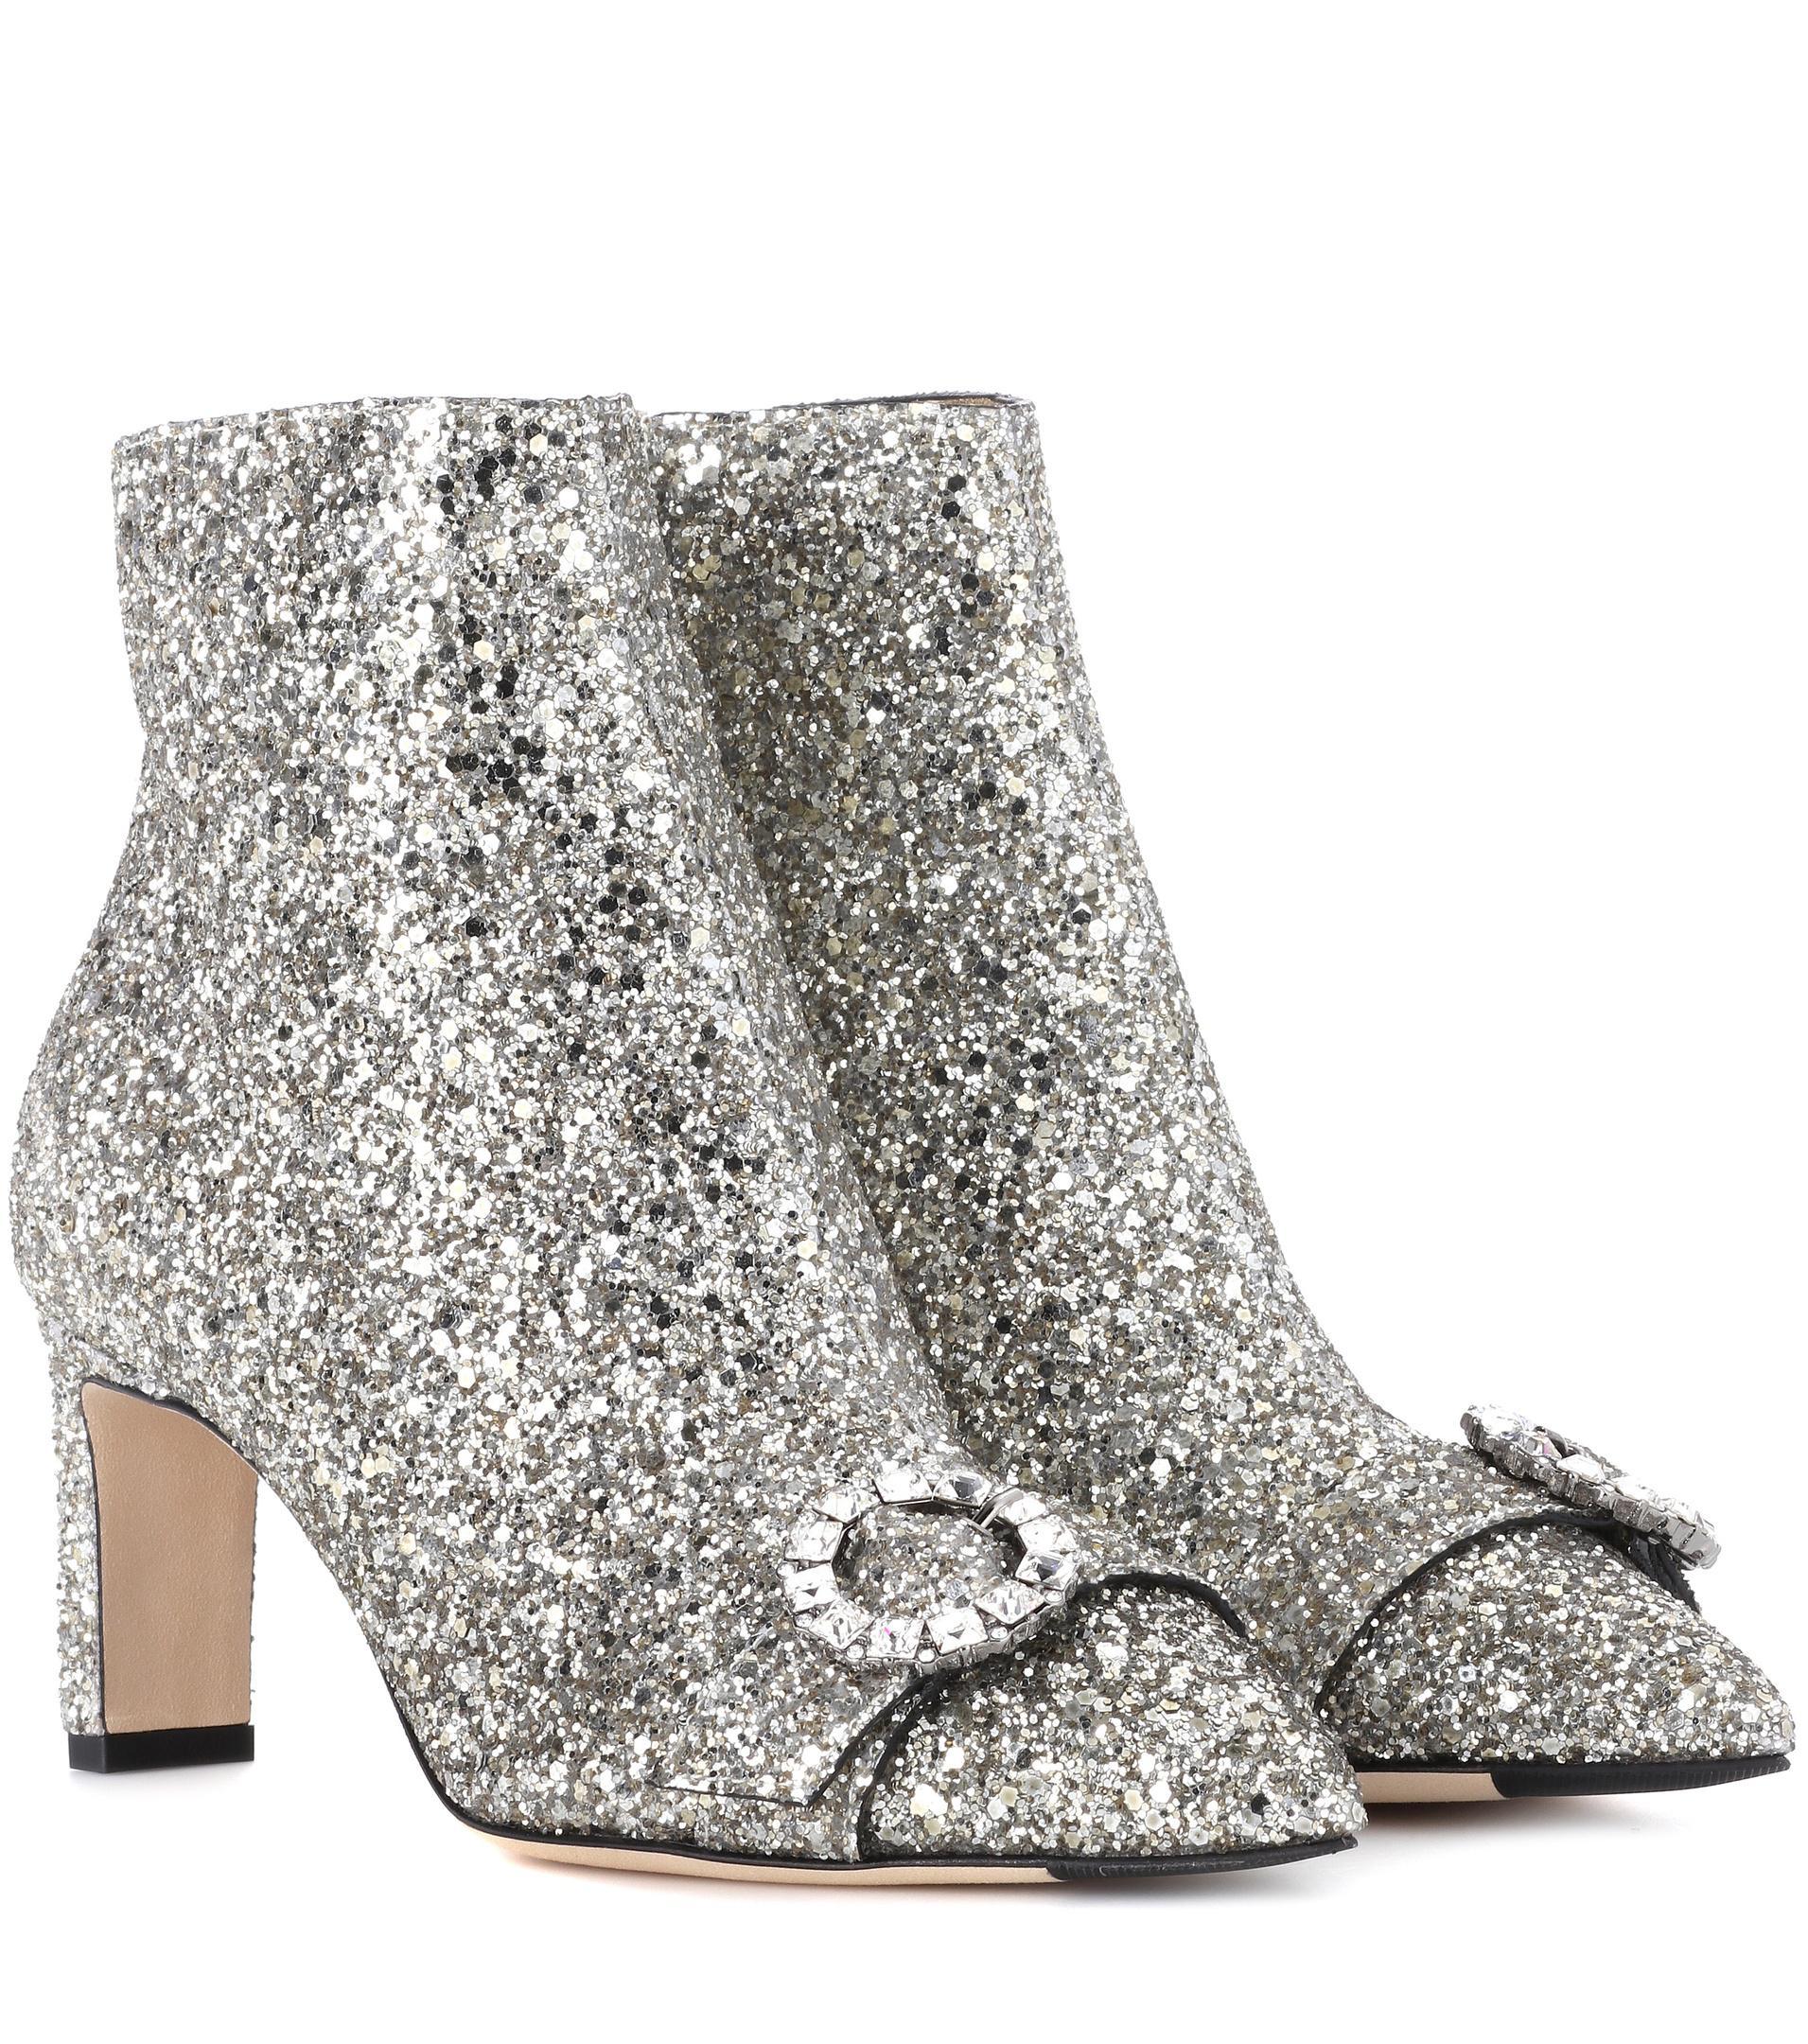 d9c7b4652b1 Boots Ankle 65 Choo Lyst Hanover Jimmy Glitter In Metallic wI7vXcxgq